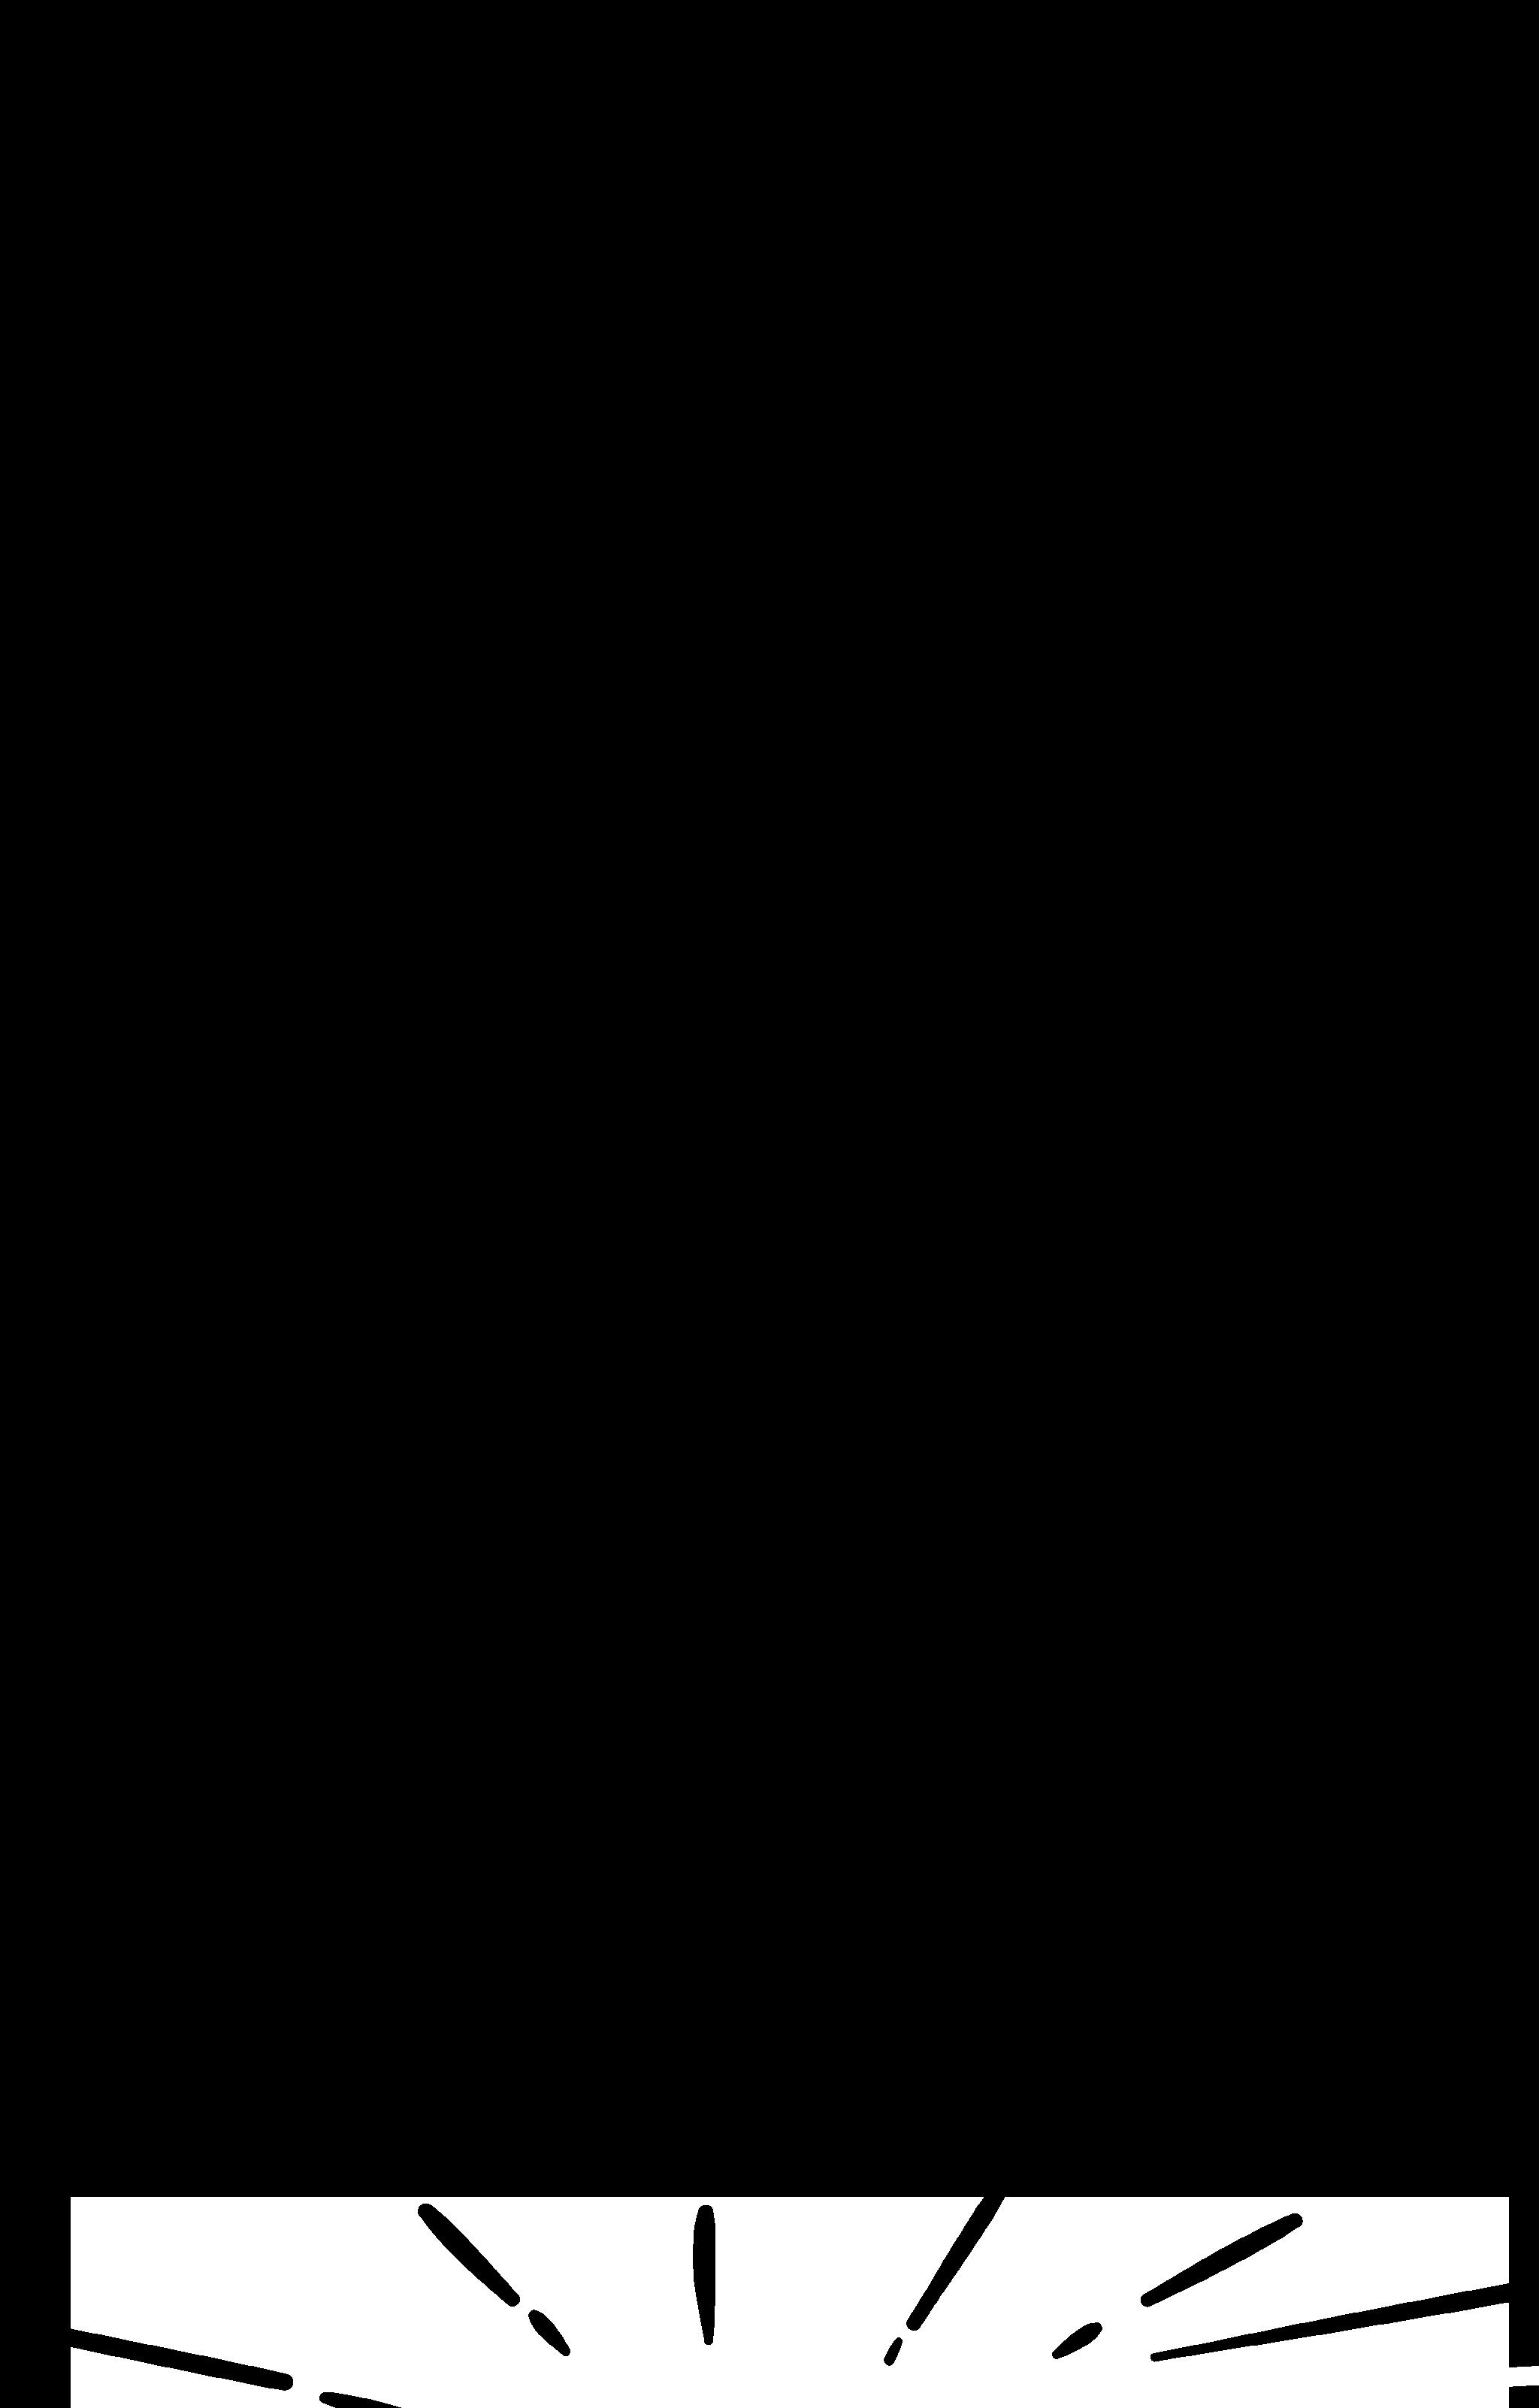 Ipad Vertical_2048x2732_Burst_Black.png